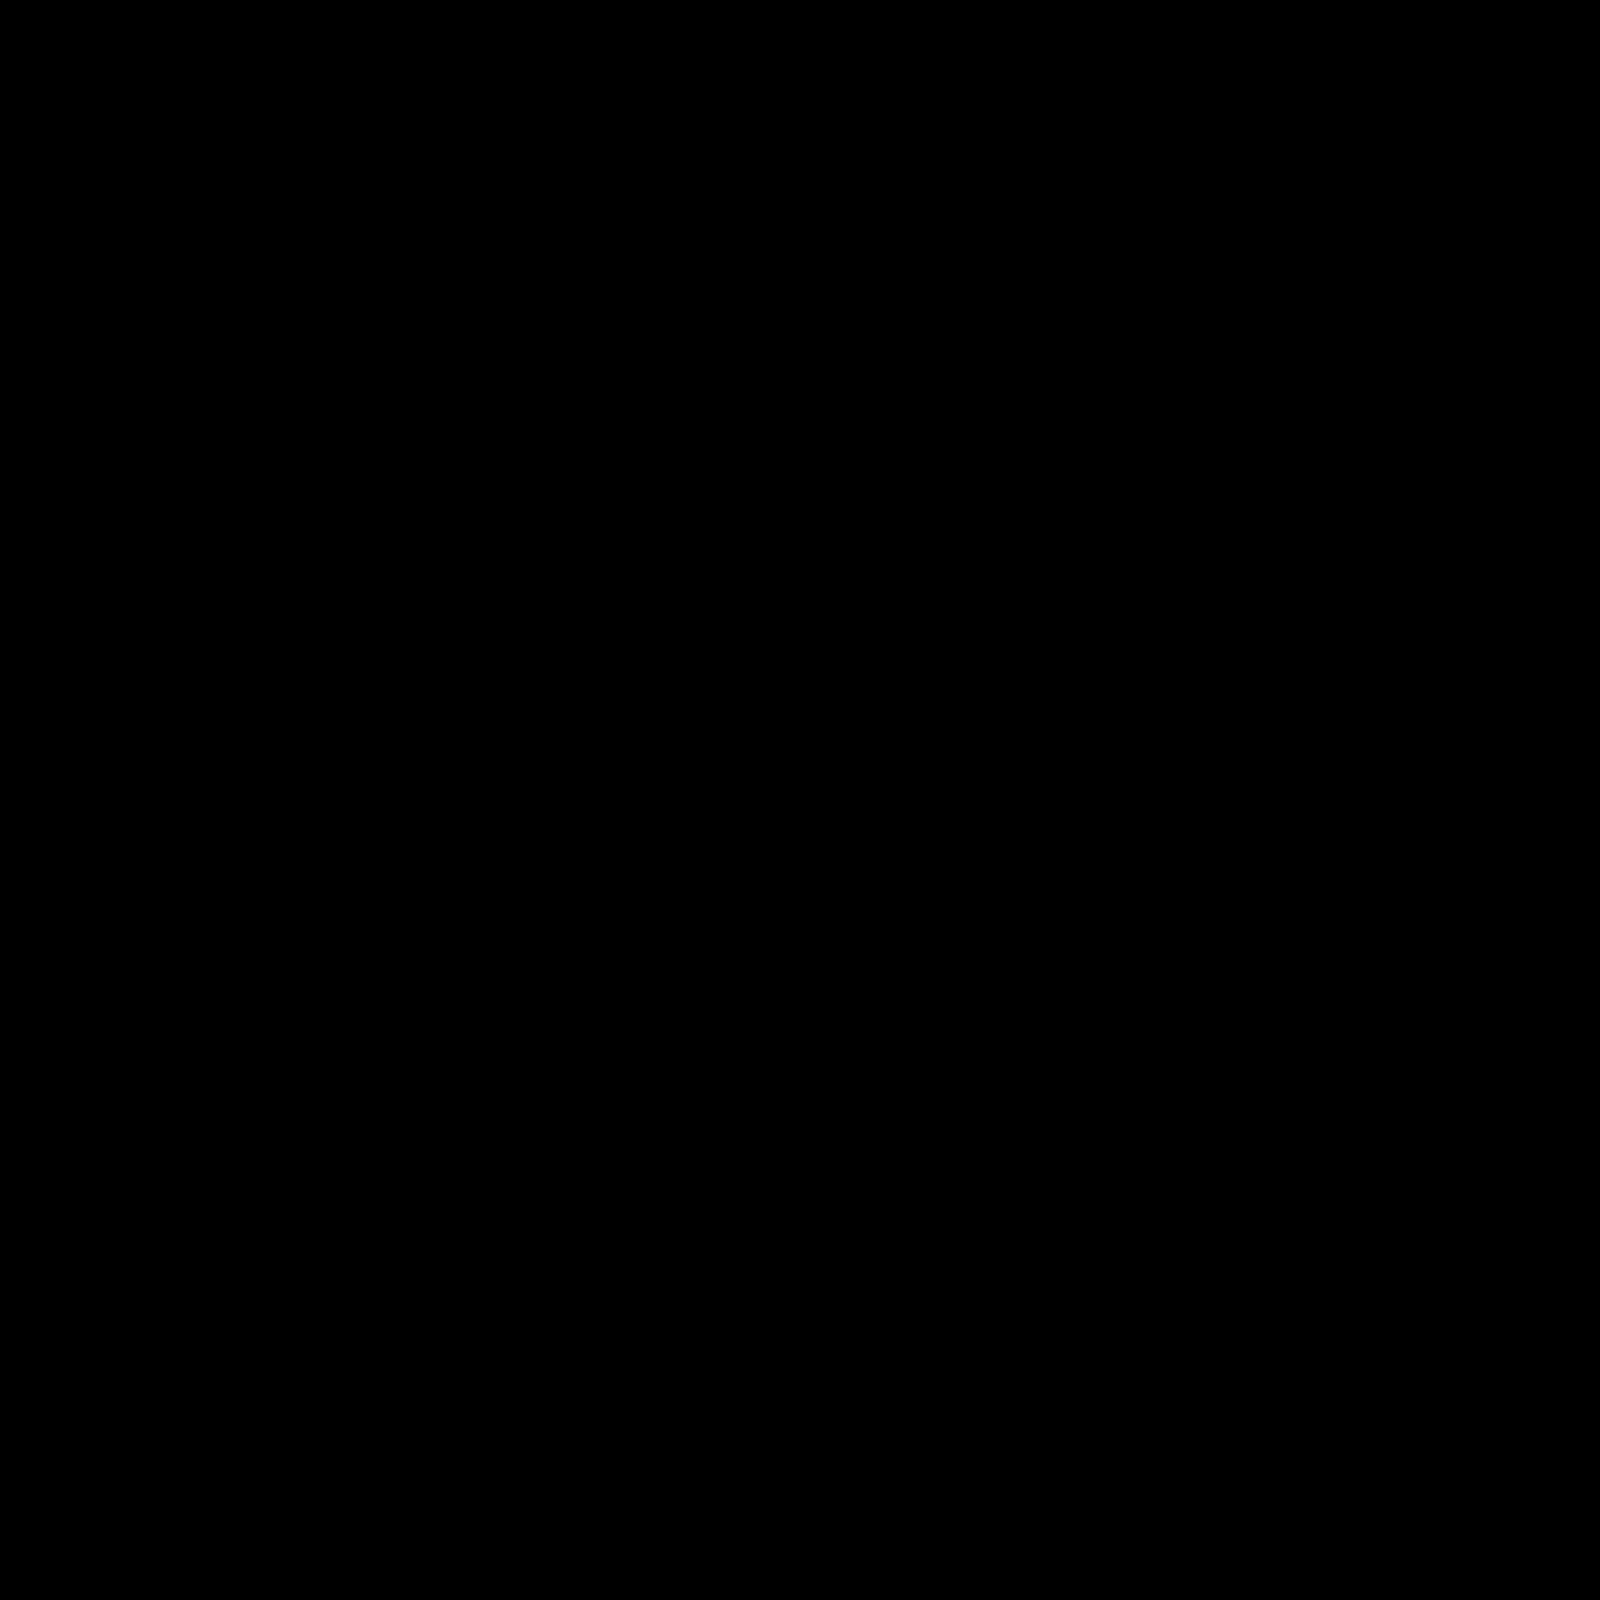 Bolt icon free download. Lightning clipart emoji